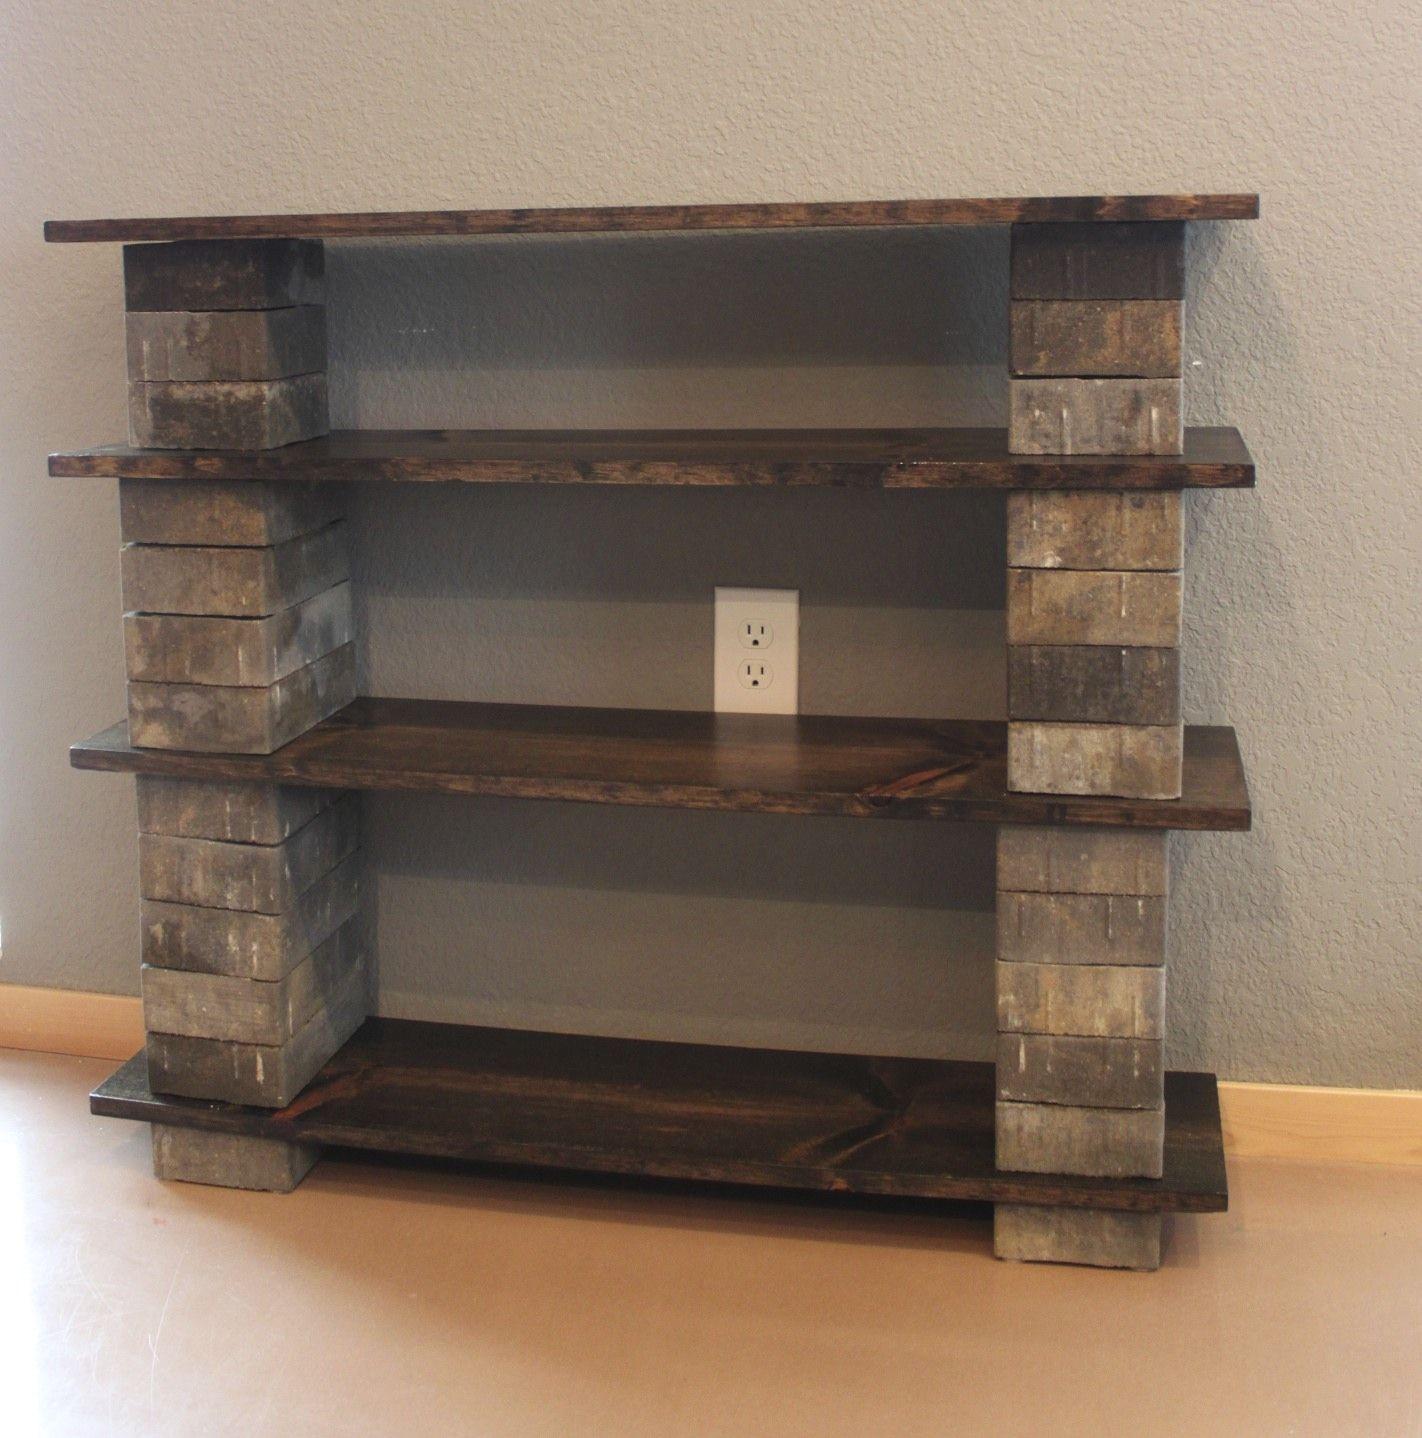 Diy Concrete Block Bookshelf Bookshelves Diy Homemade